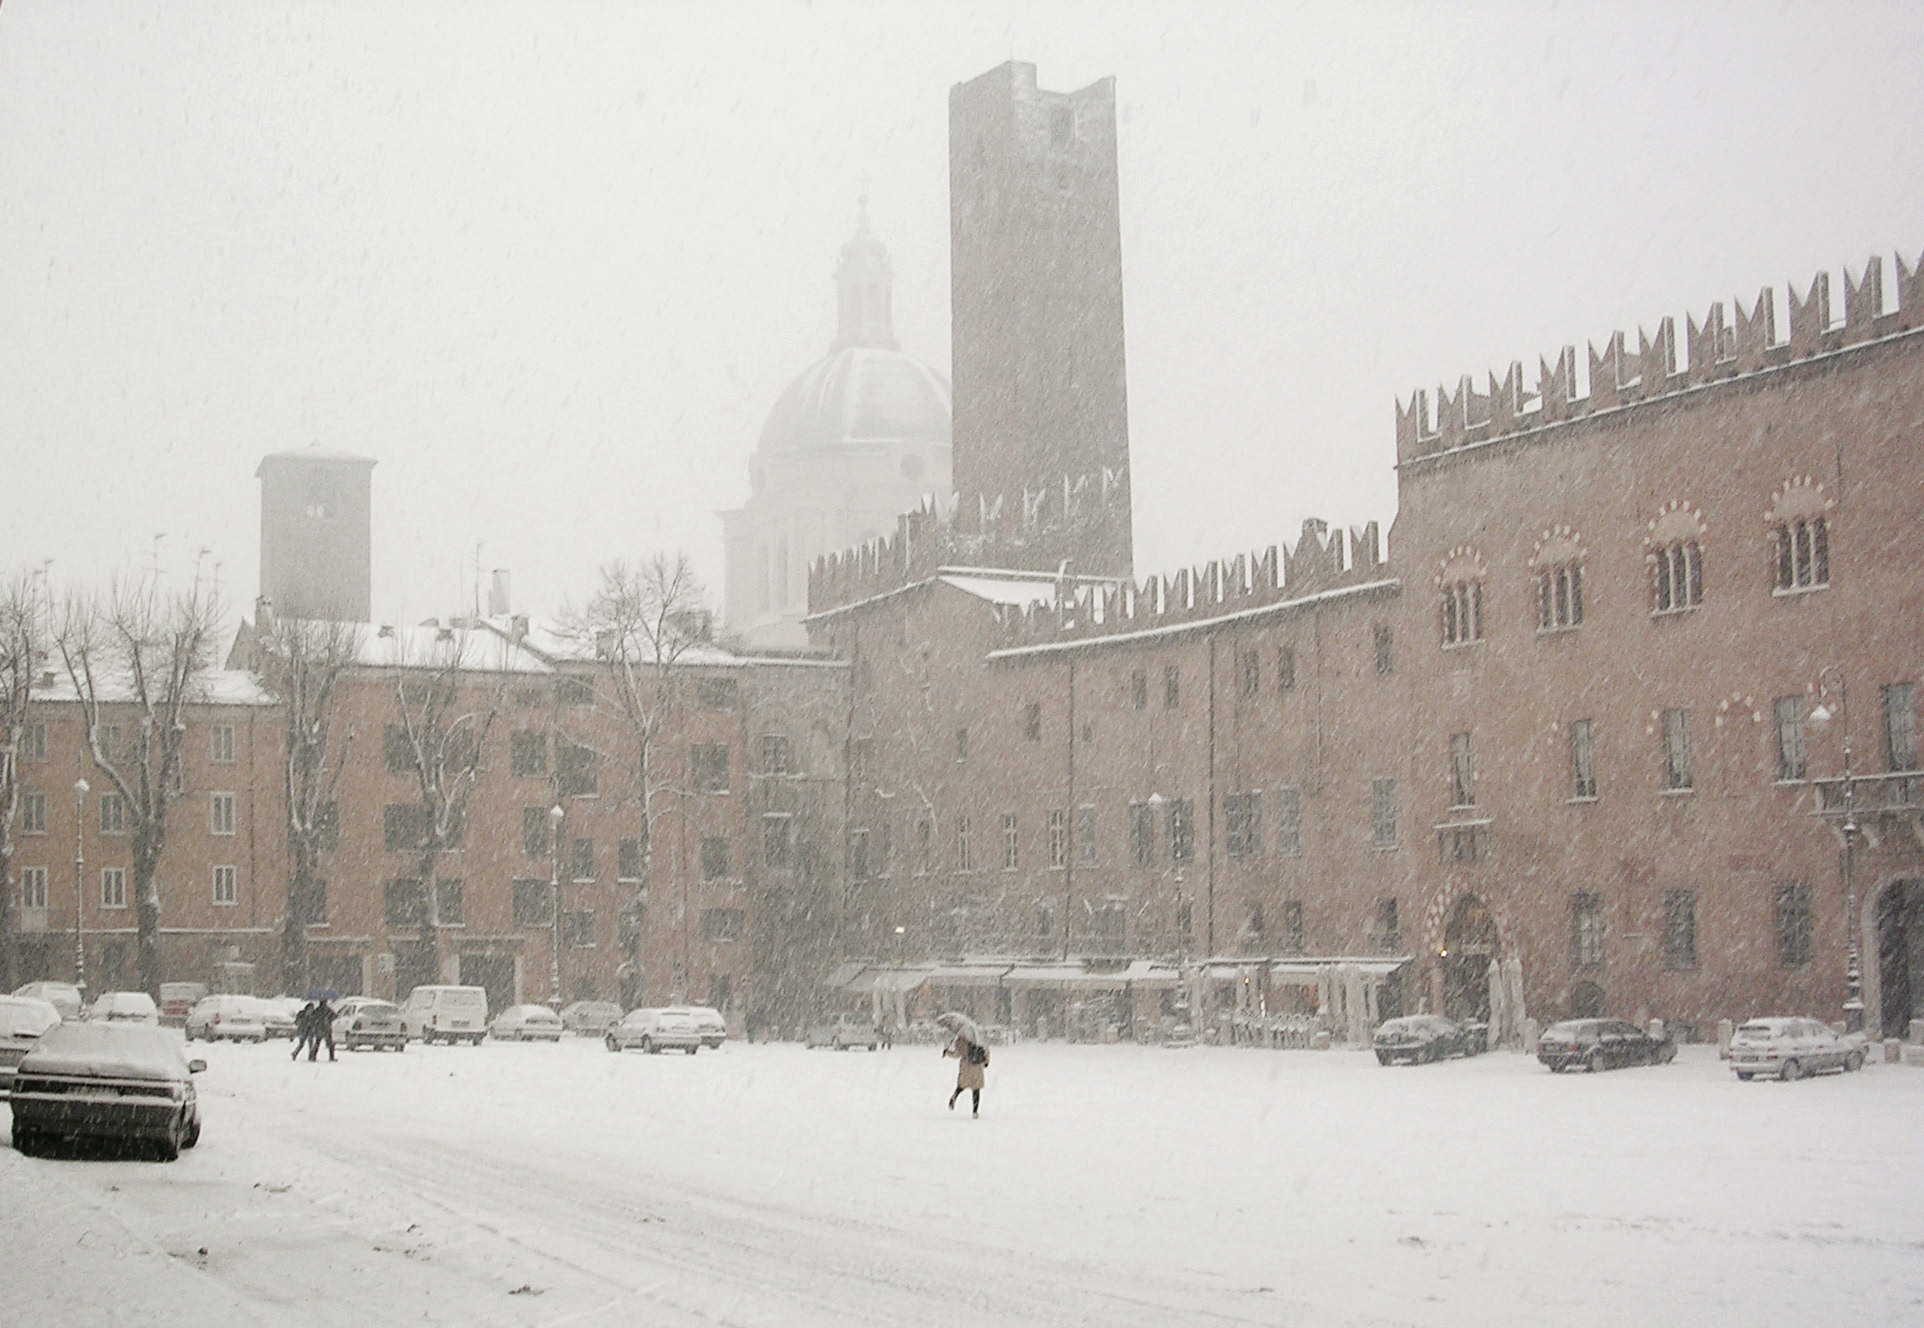 E sarà Natale. - Pagina 5 Mantova_piazza_Sordello_innevata